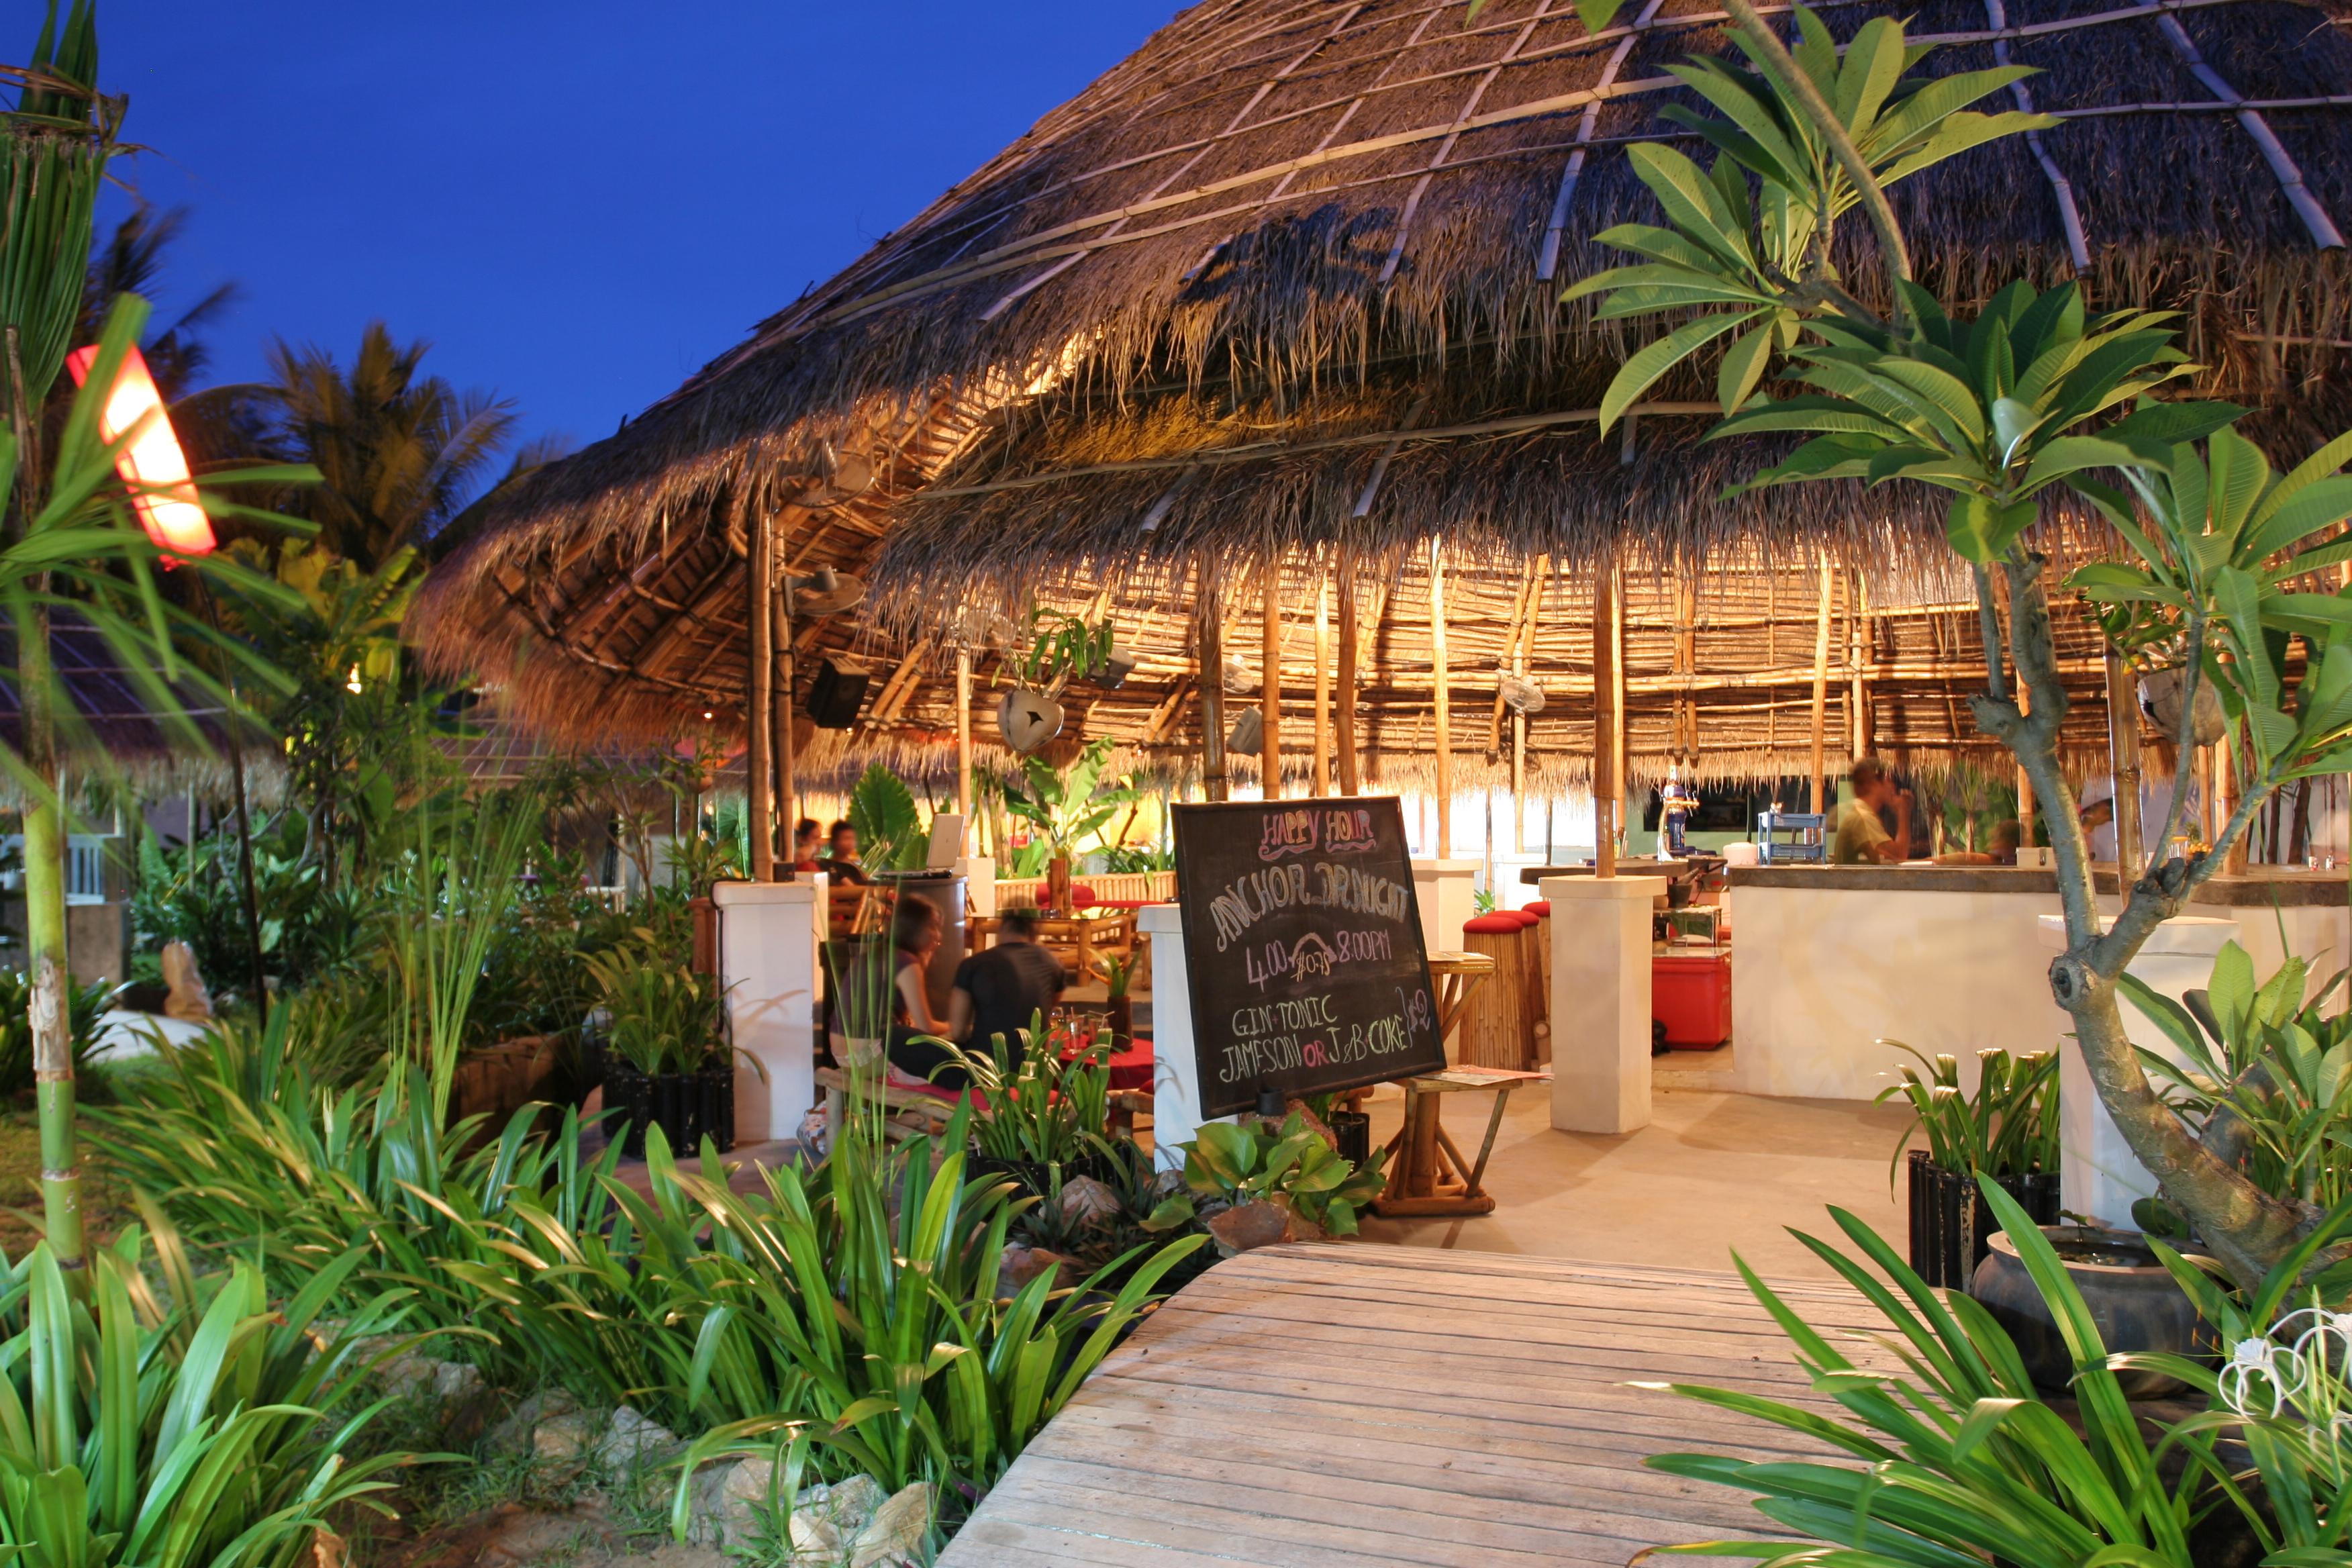 Island Bar - Image:Angkornight market